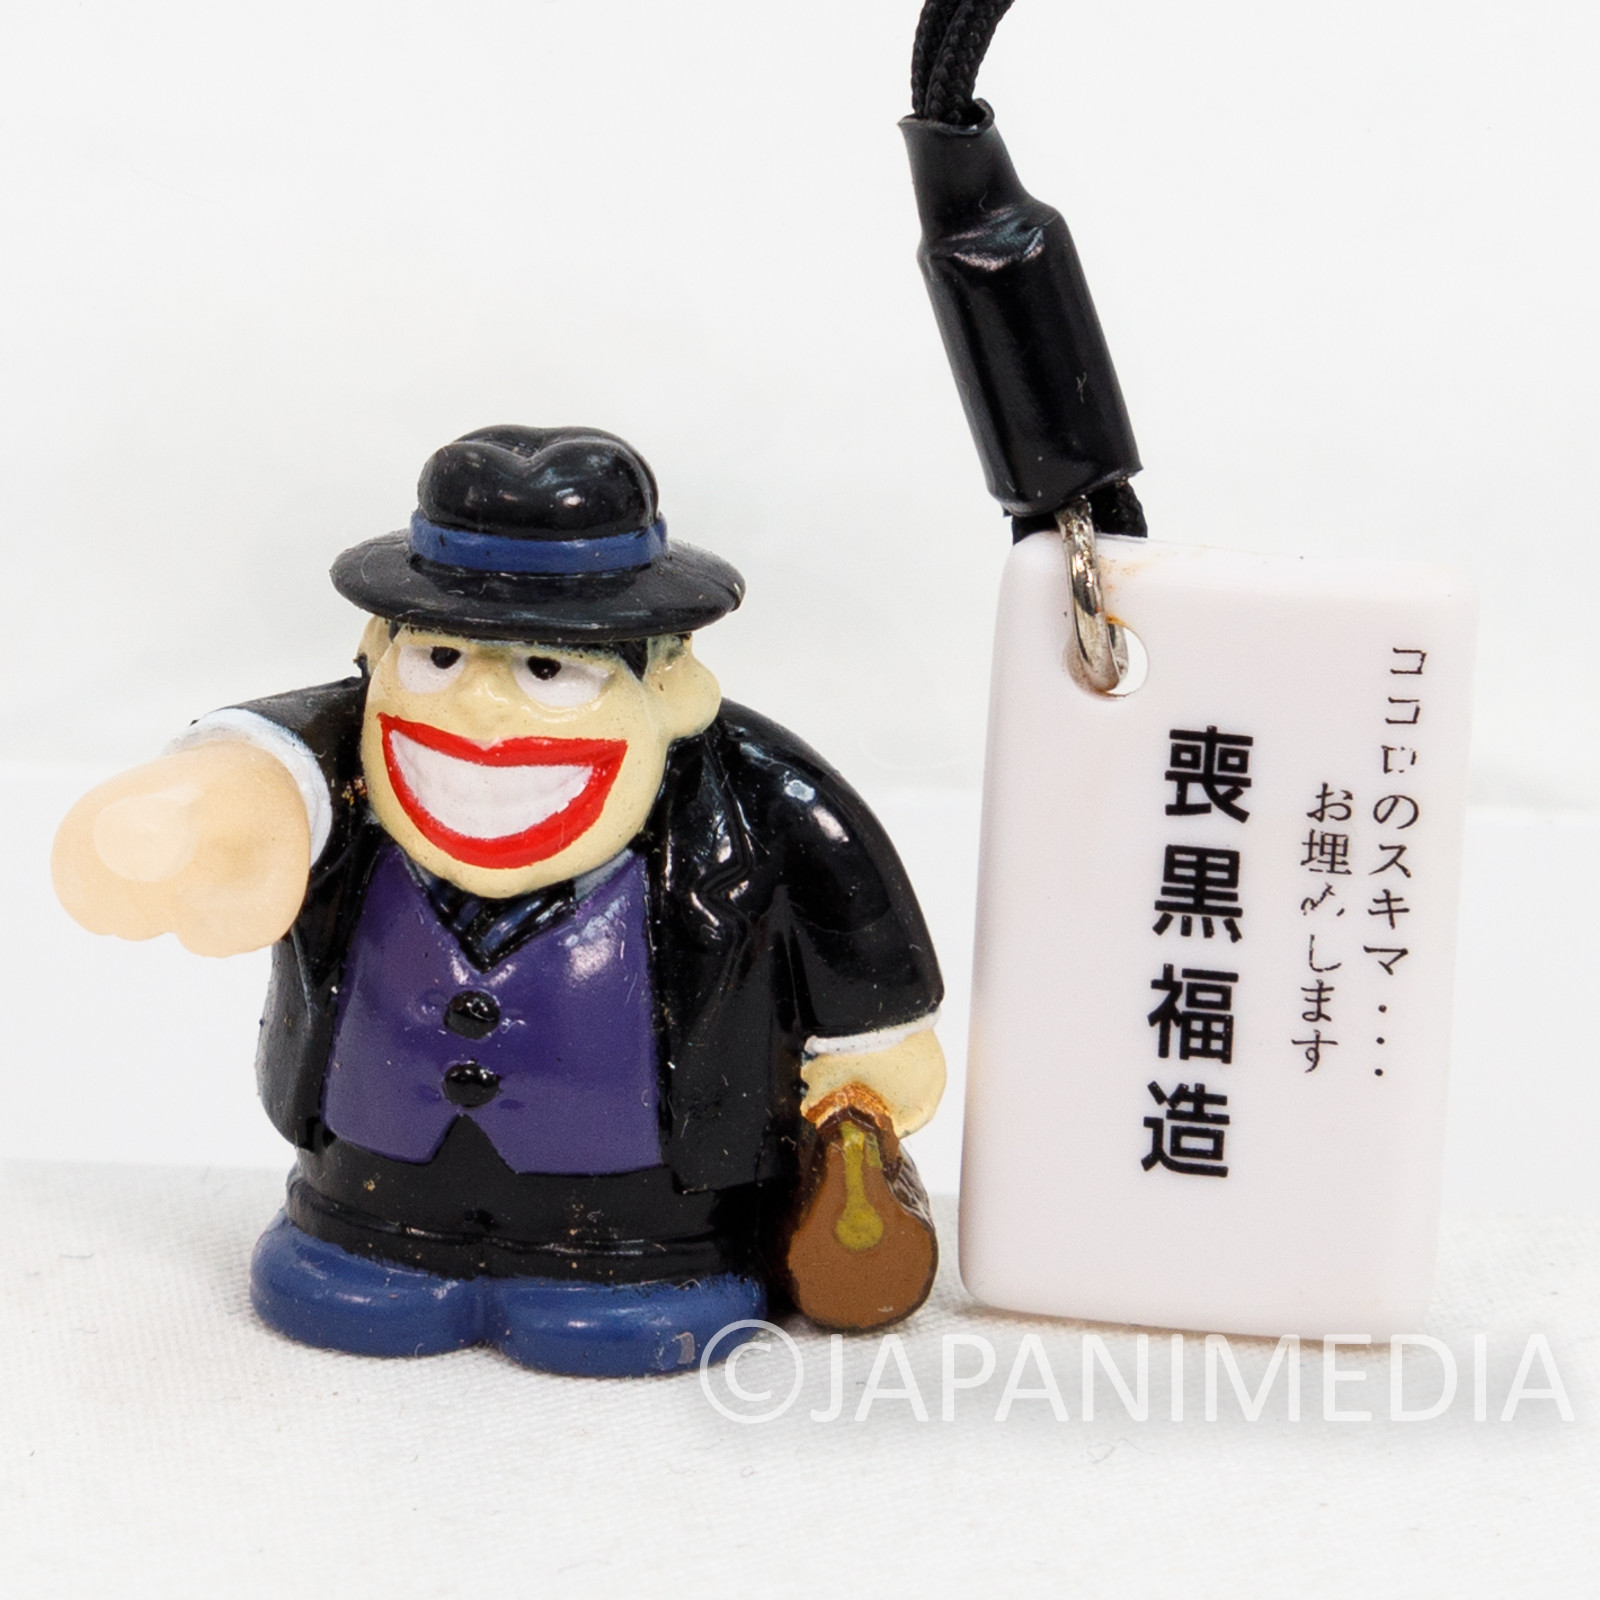 Warau Laughing Salesman Fukuzo Moguro Figure & Strap JAPAN ANIME